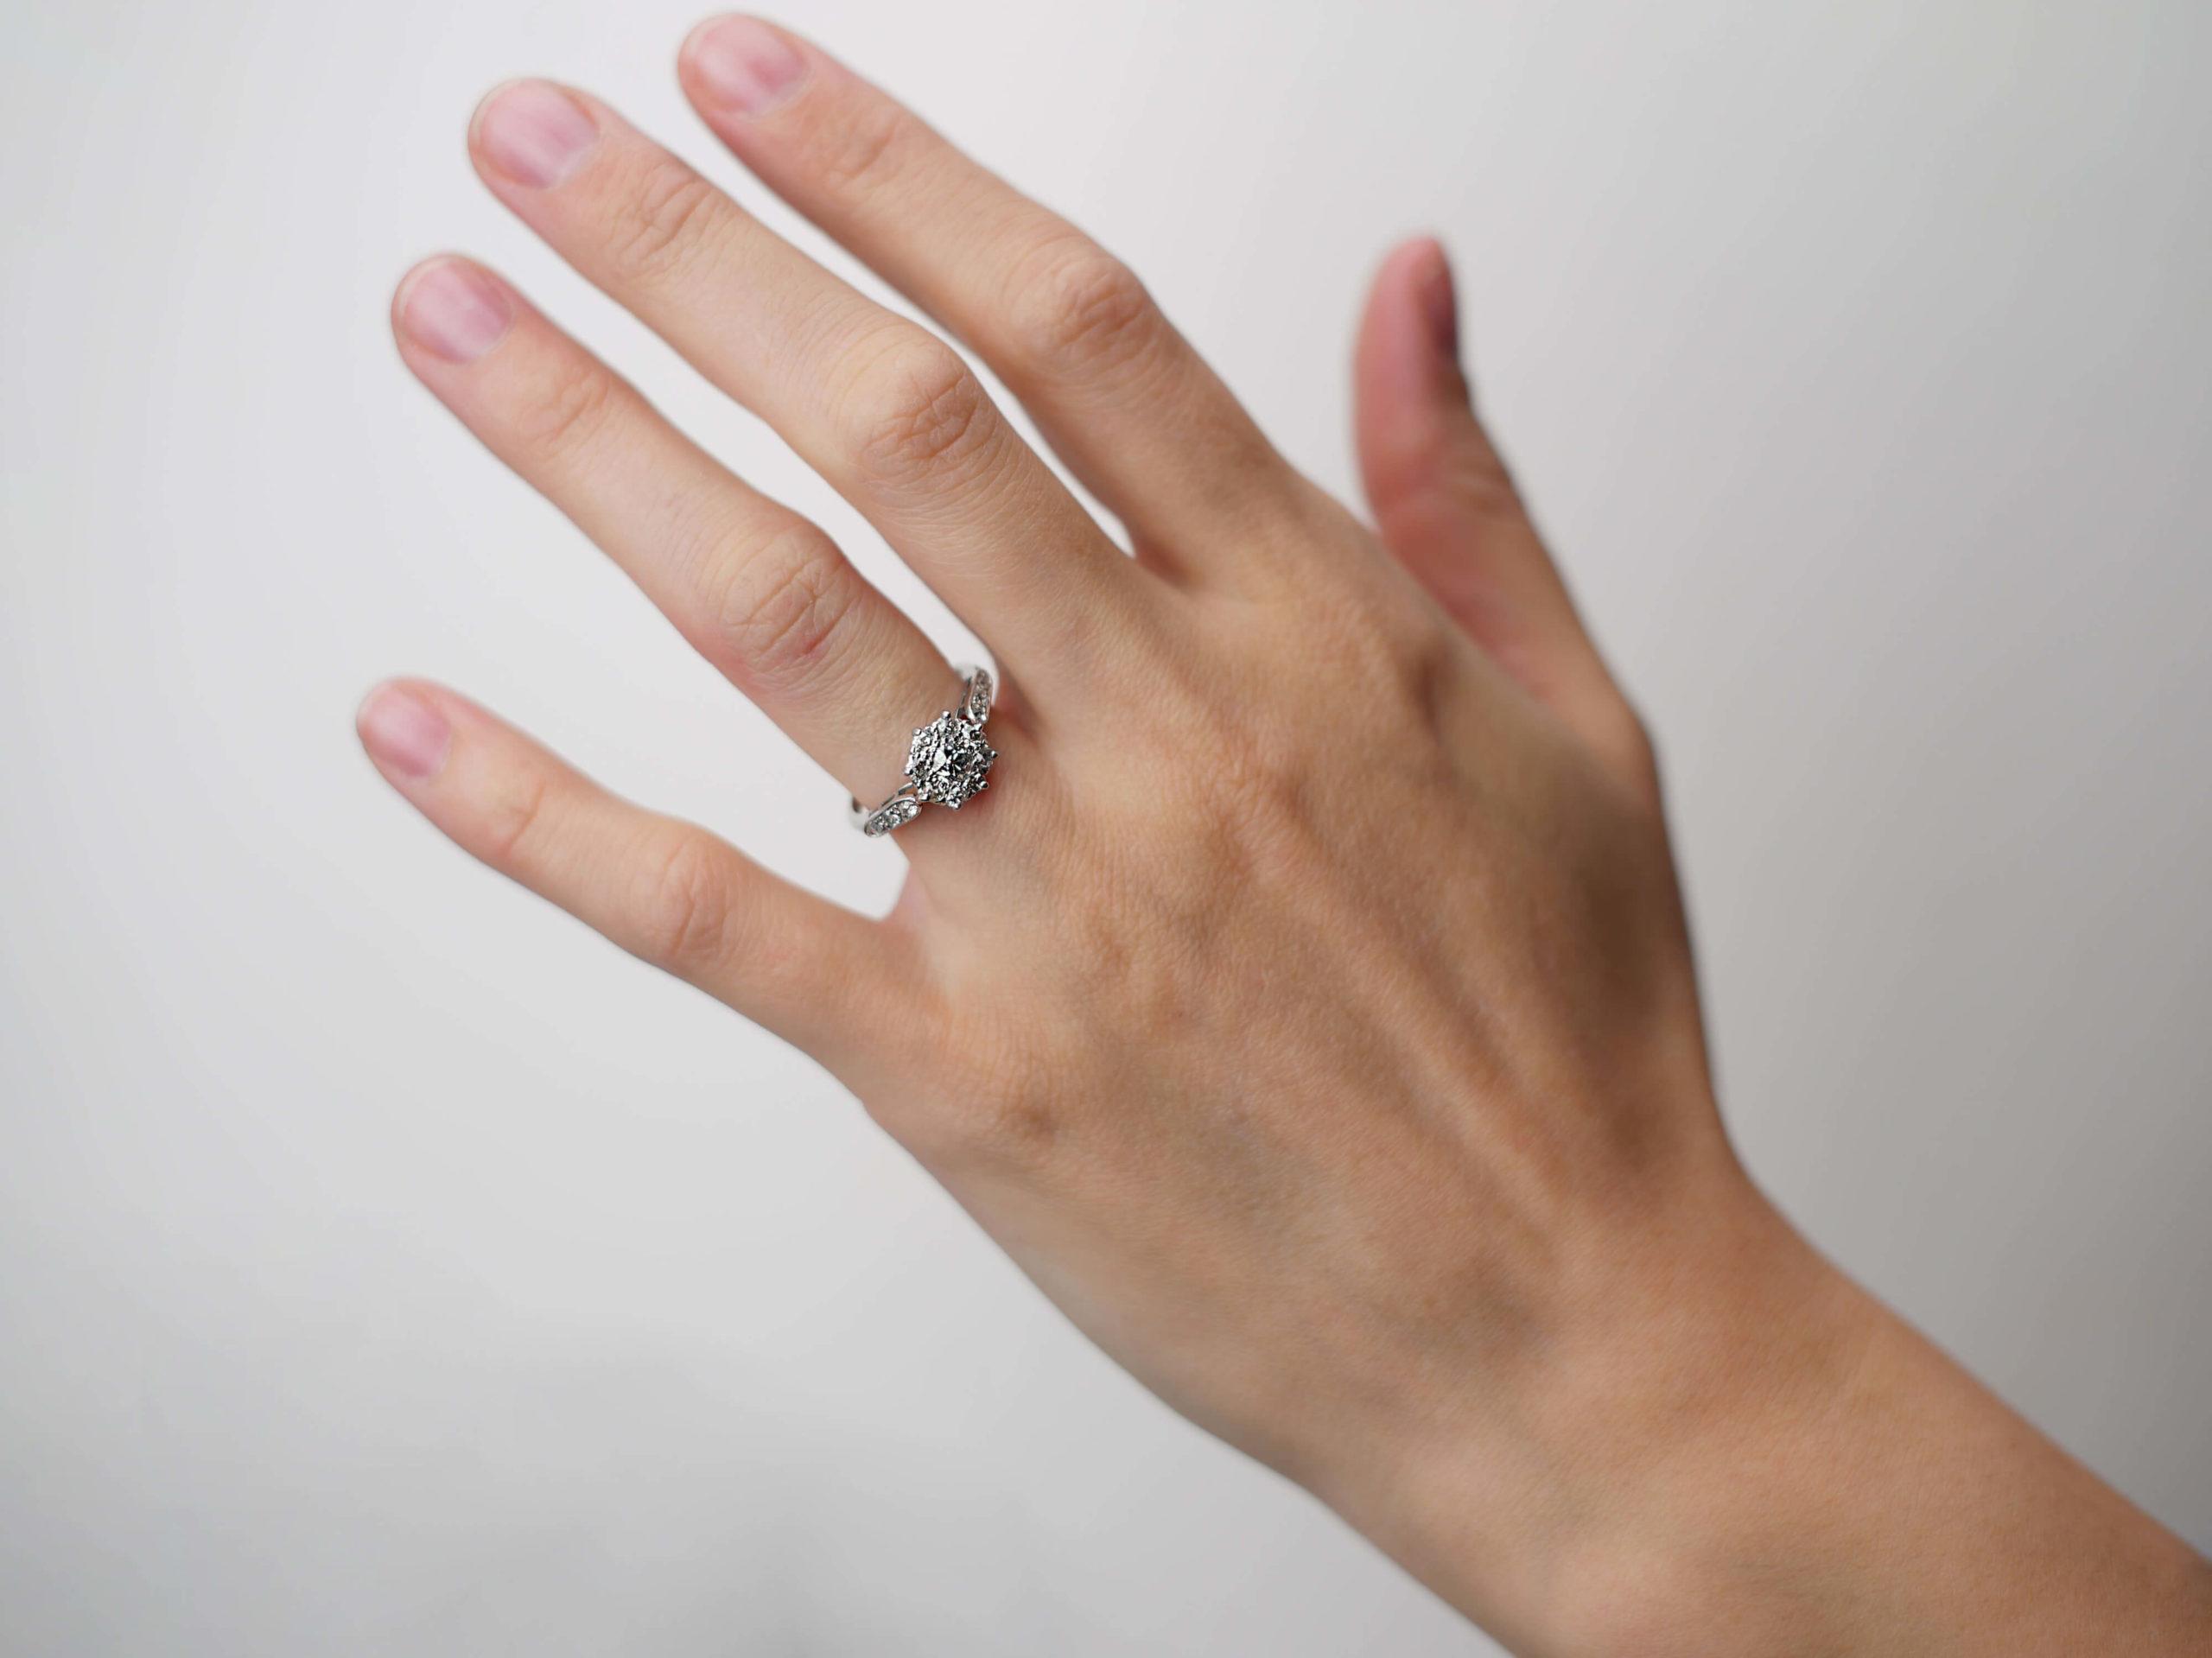 Edwardian 18ct White Gold & Platinum, Diamond Cluster Ring with Diamond set Shoulders